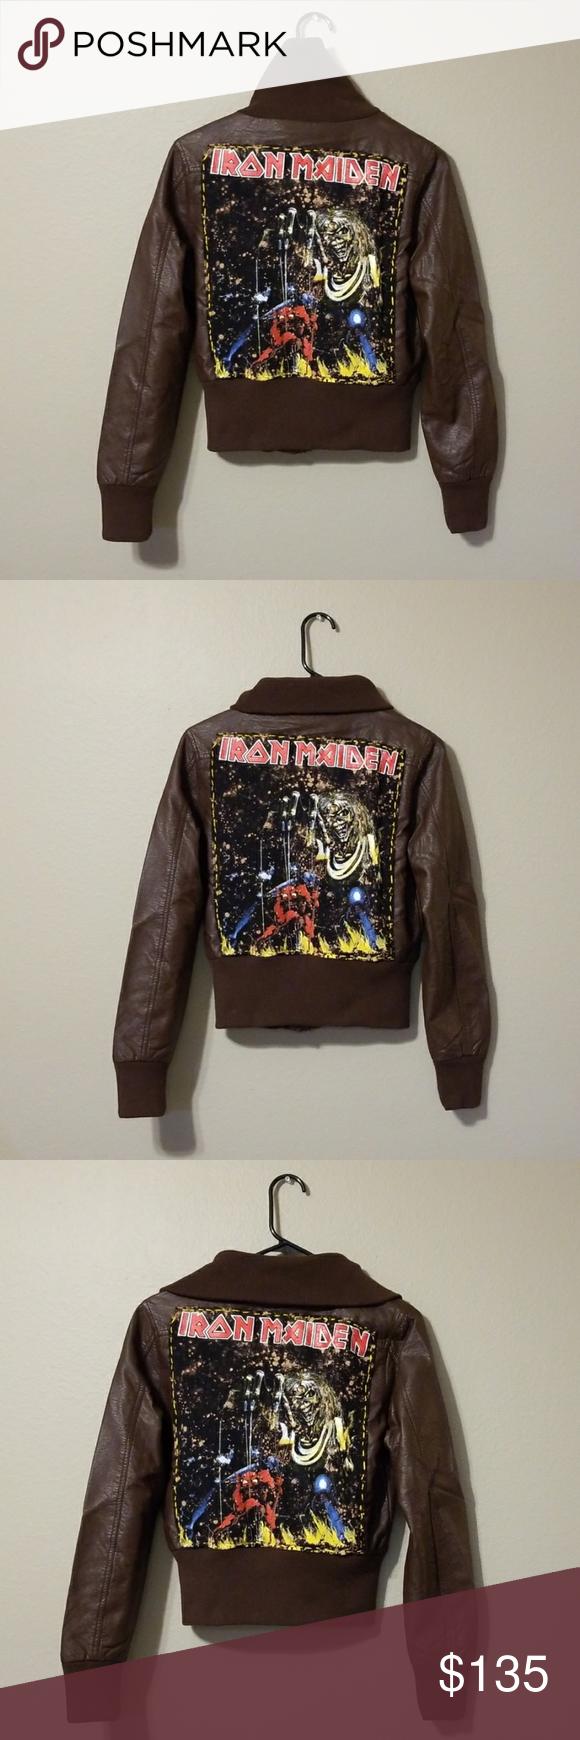 Iron Maiden Jacket Punk Jacket Band Jacket New Punk Jackets Band Jacket Clothes Design [ 1740 x 580 Pixel ]